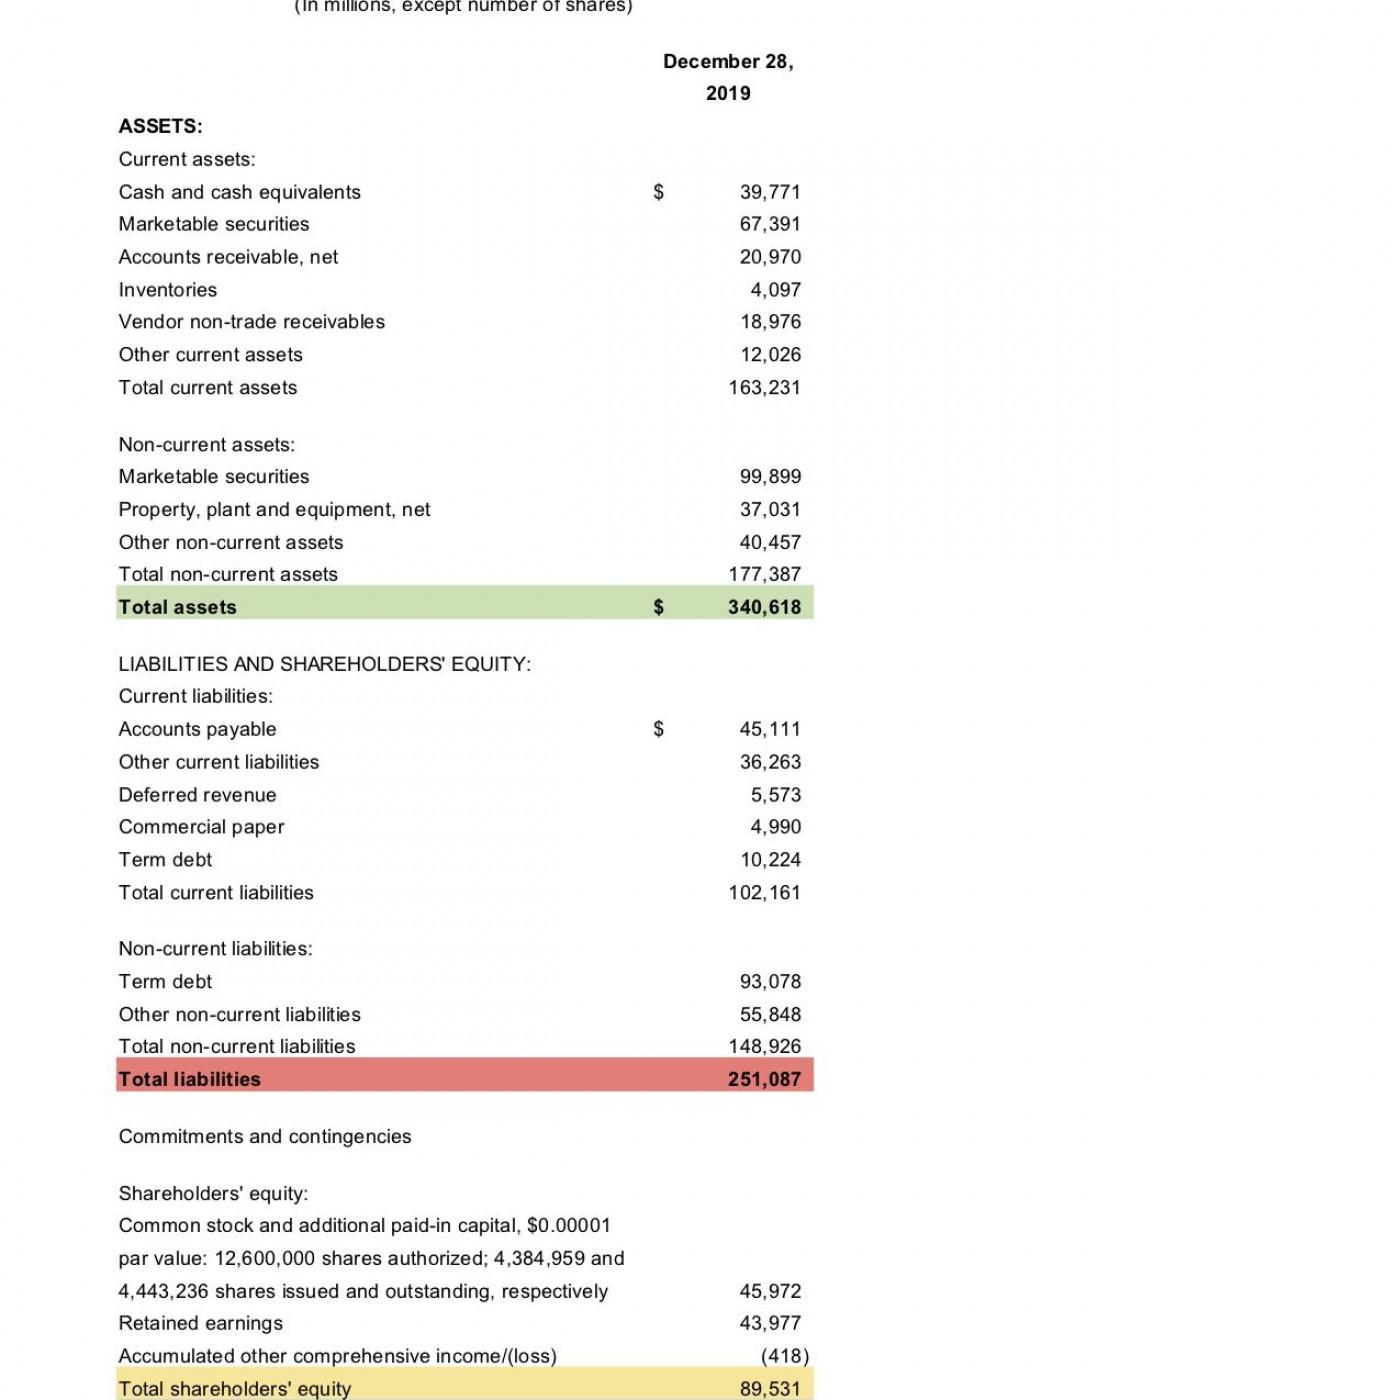 008 Surprising Basic Balance Sheet Template Design  Simple Free For Self Employed Example Uk1400